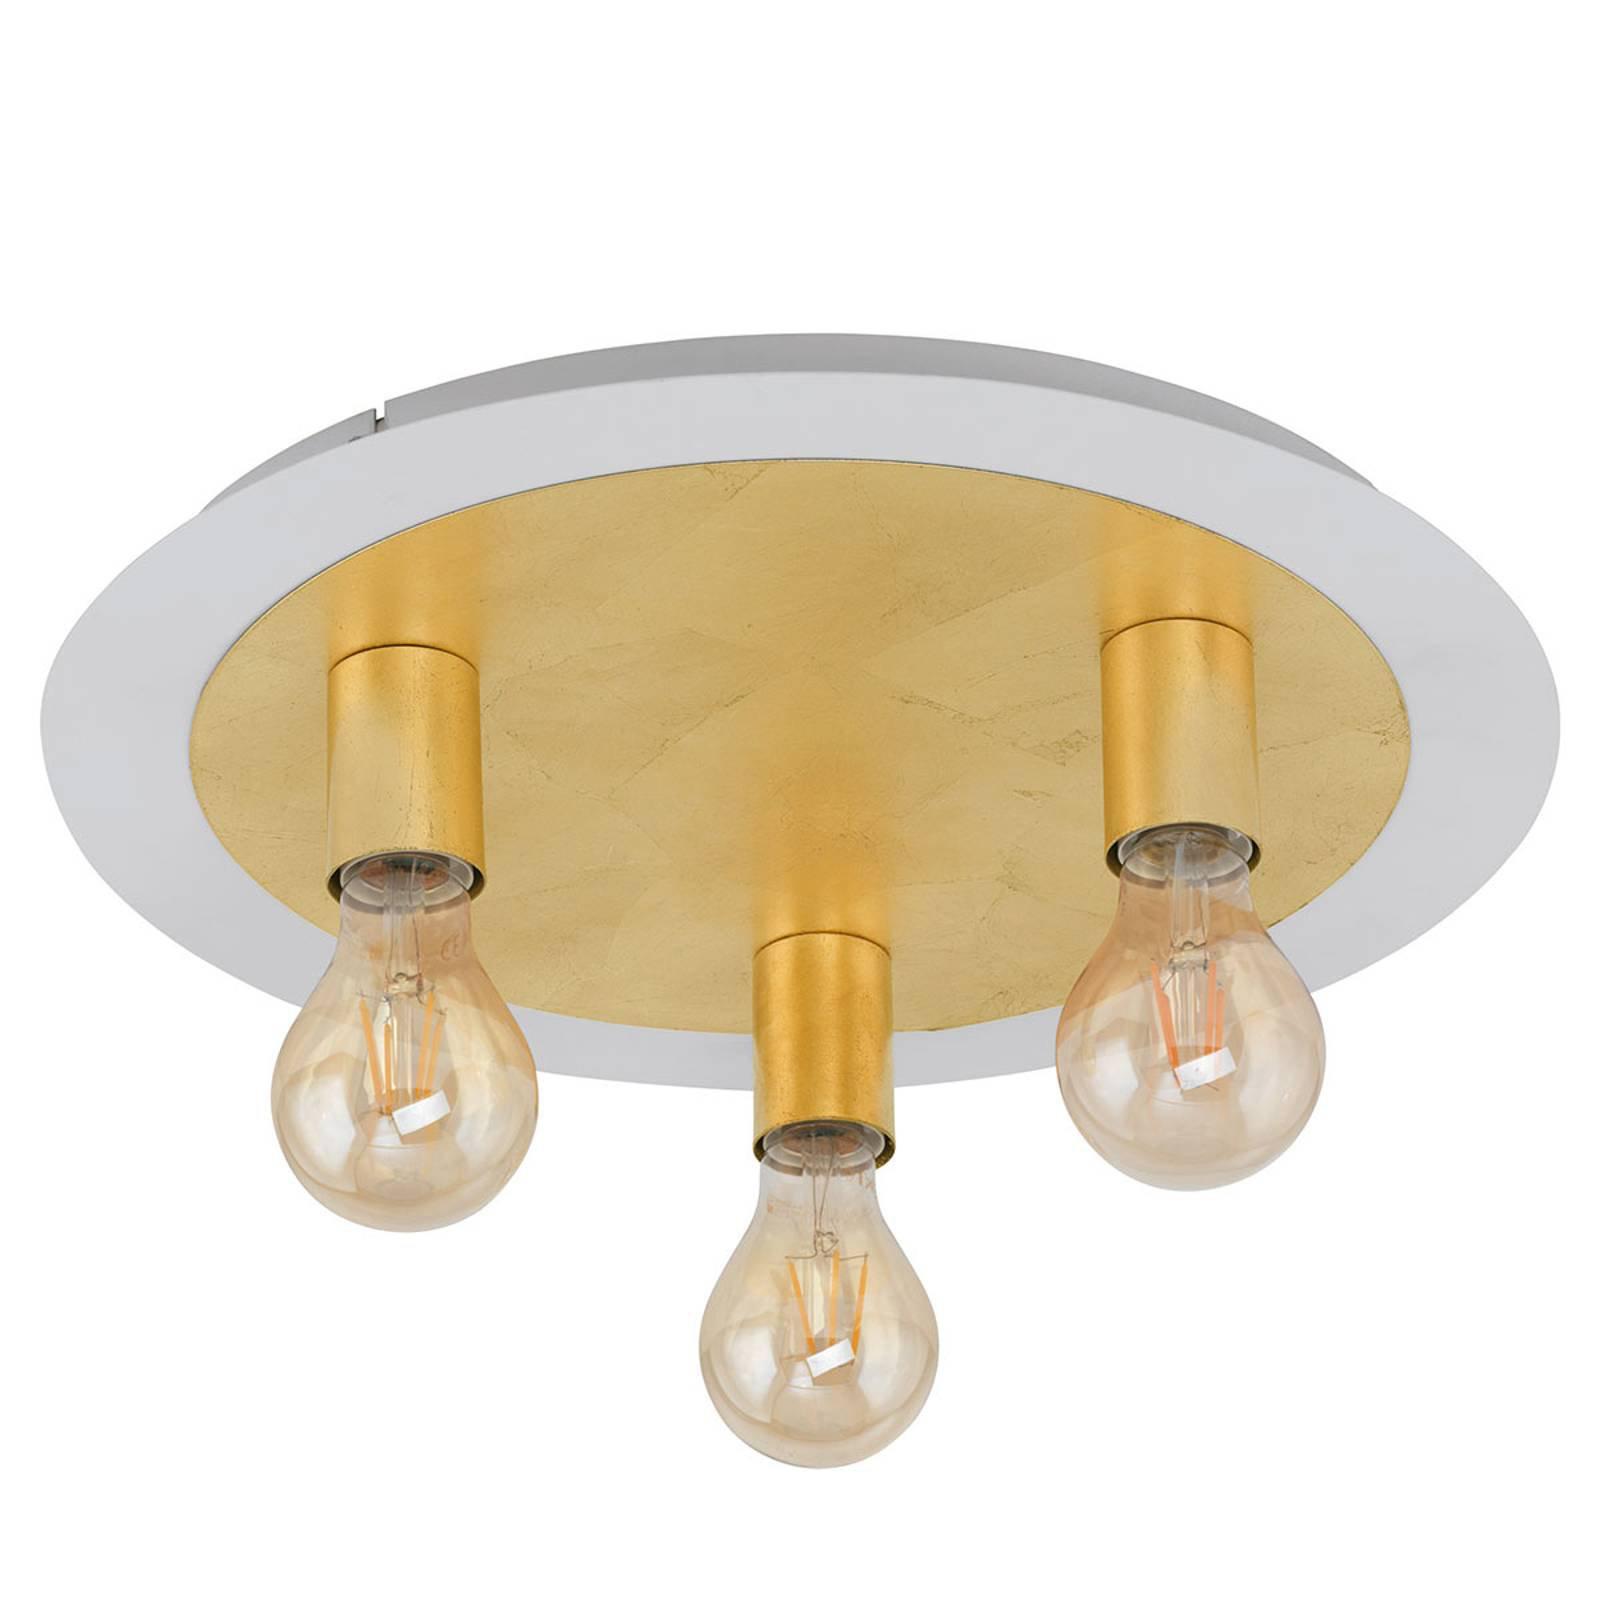 LED-taklampe Passano 3 lyskilder gull